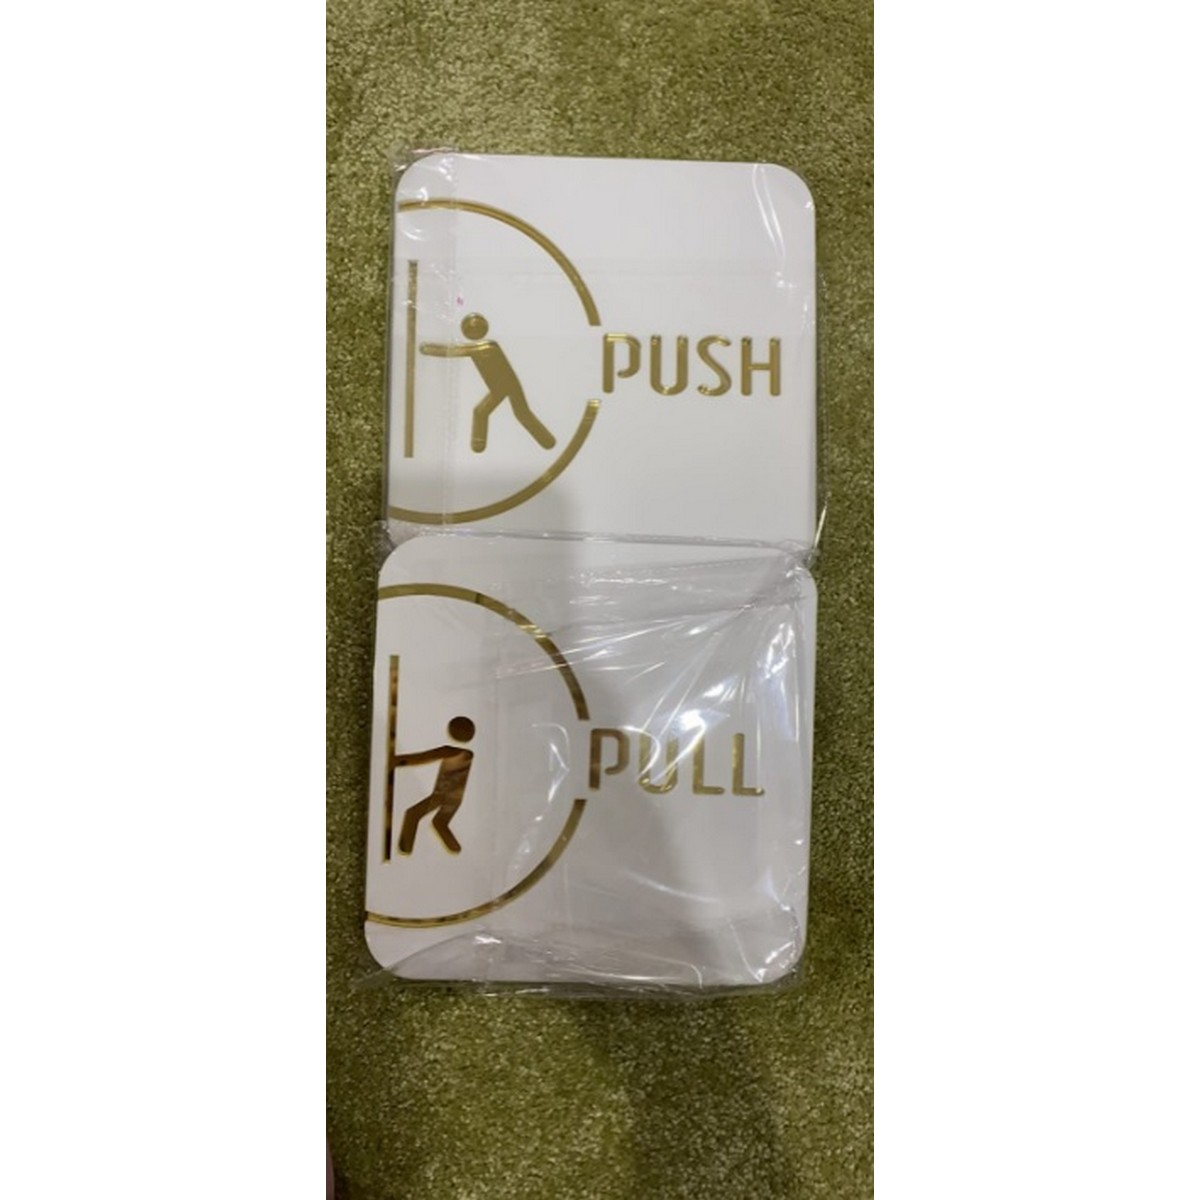 PushPull Acrylic Door Signages  PushPull Acrylic Door Signages 3